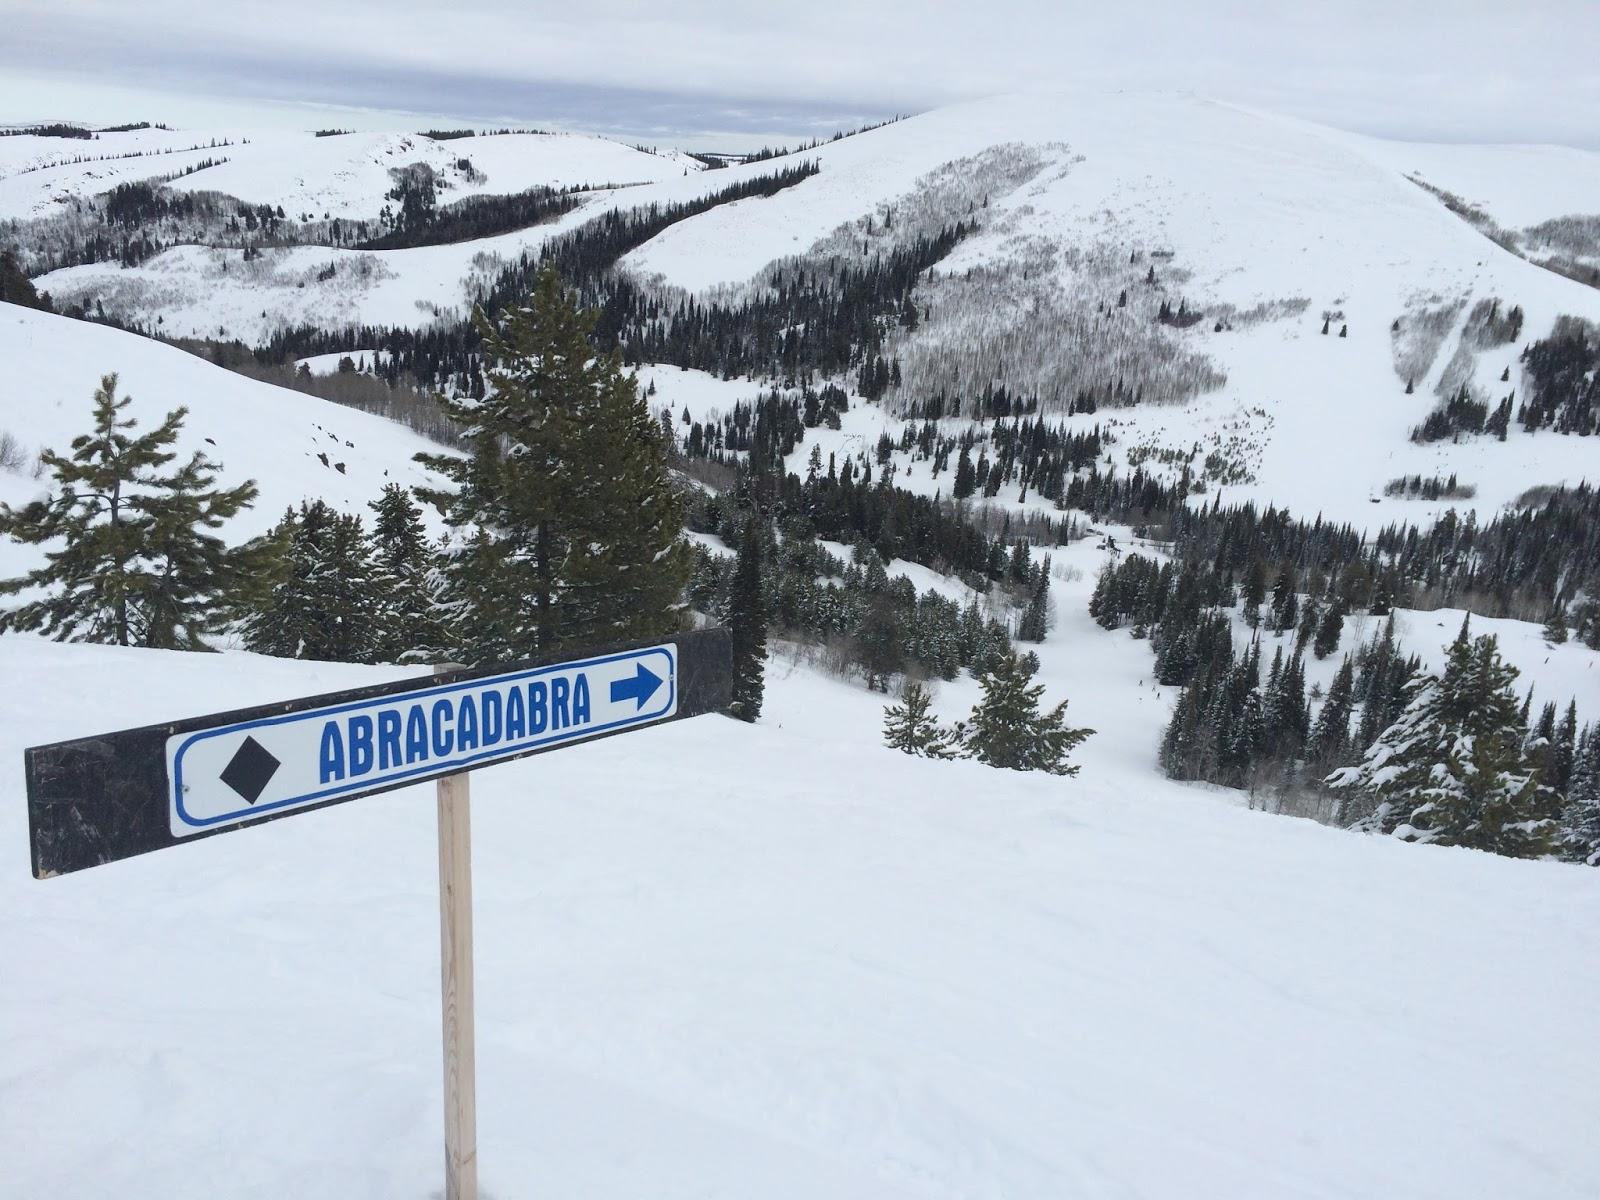 stueby's outdoor journal: road trip! take a tour of magic mountain